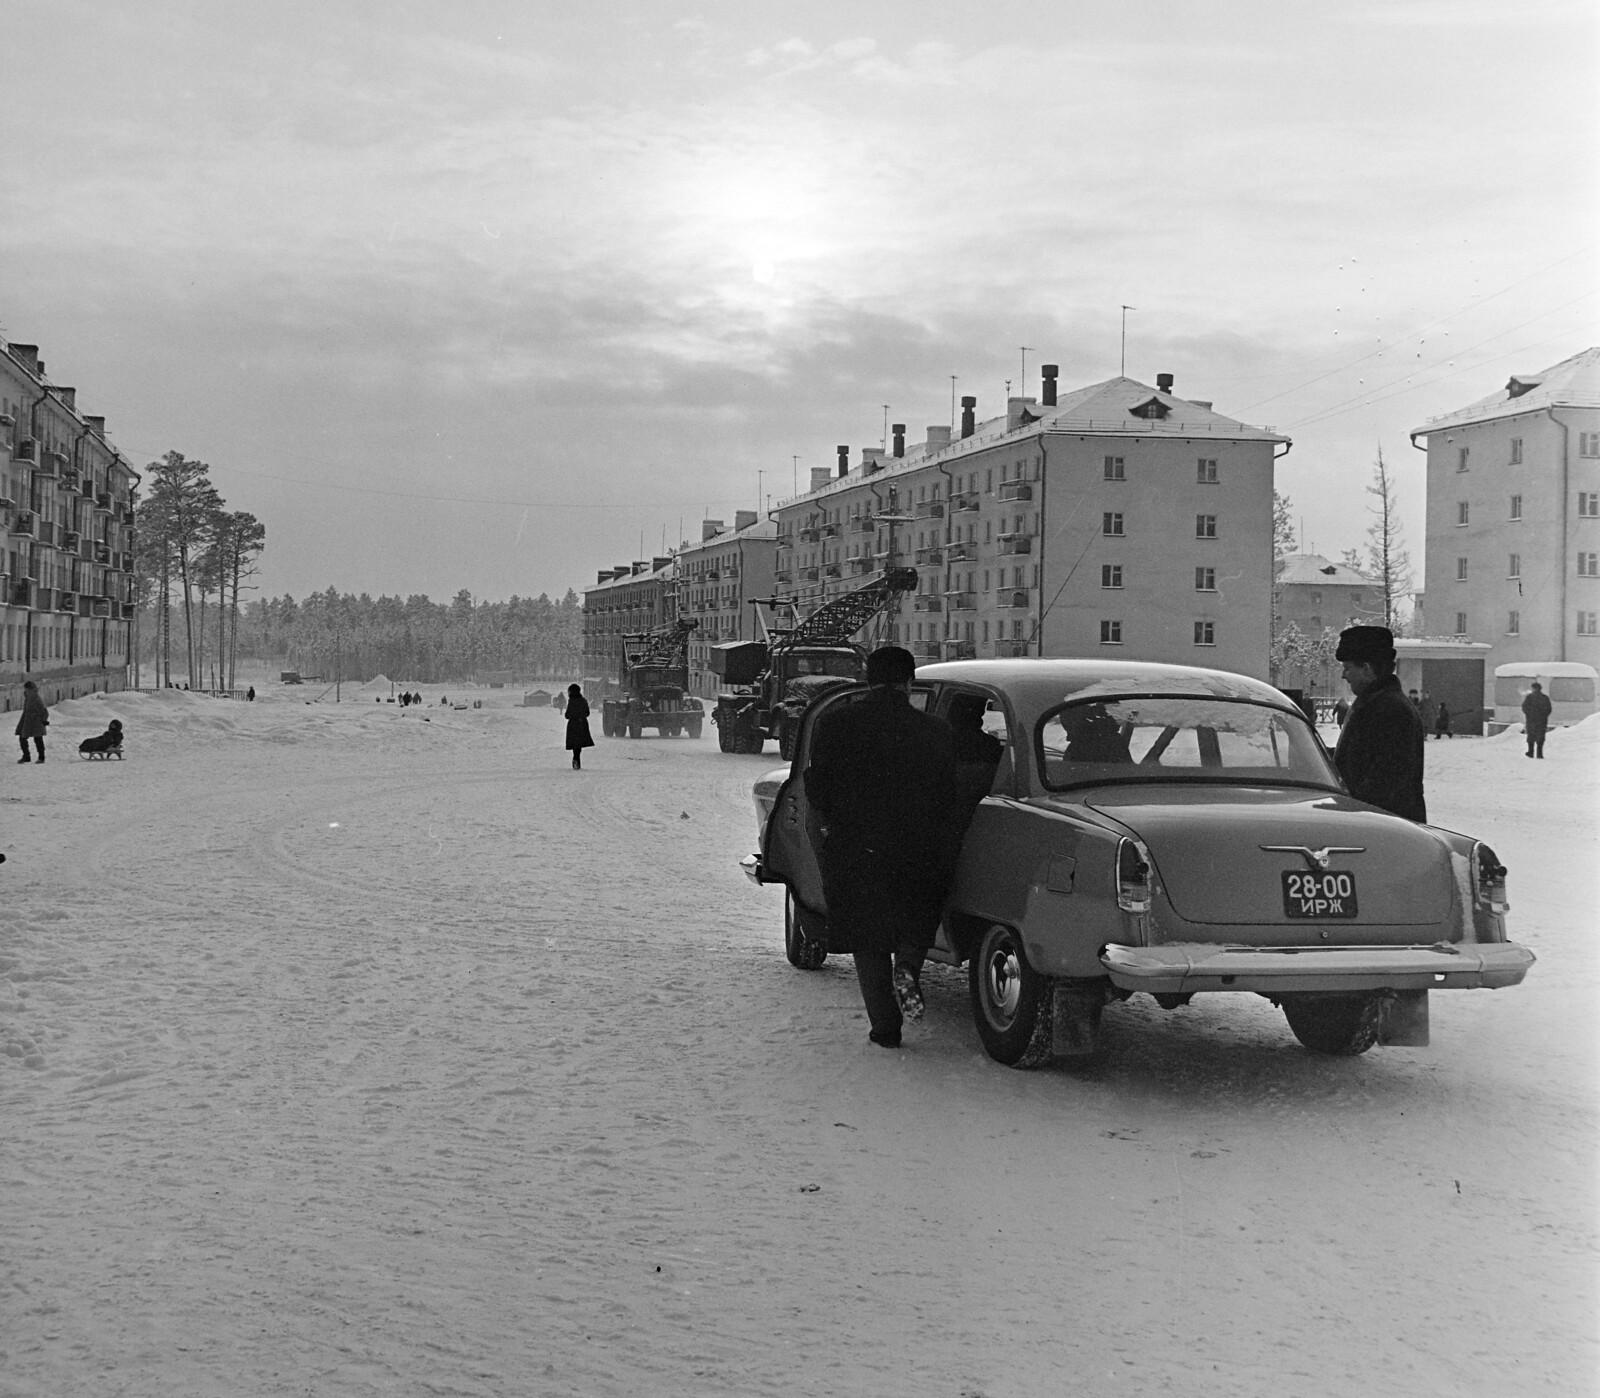 Братск. Улица Наймушина  выходит на улицу Холоднова.